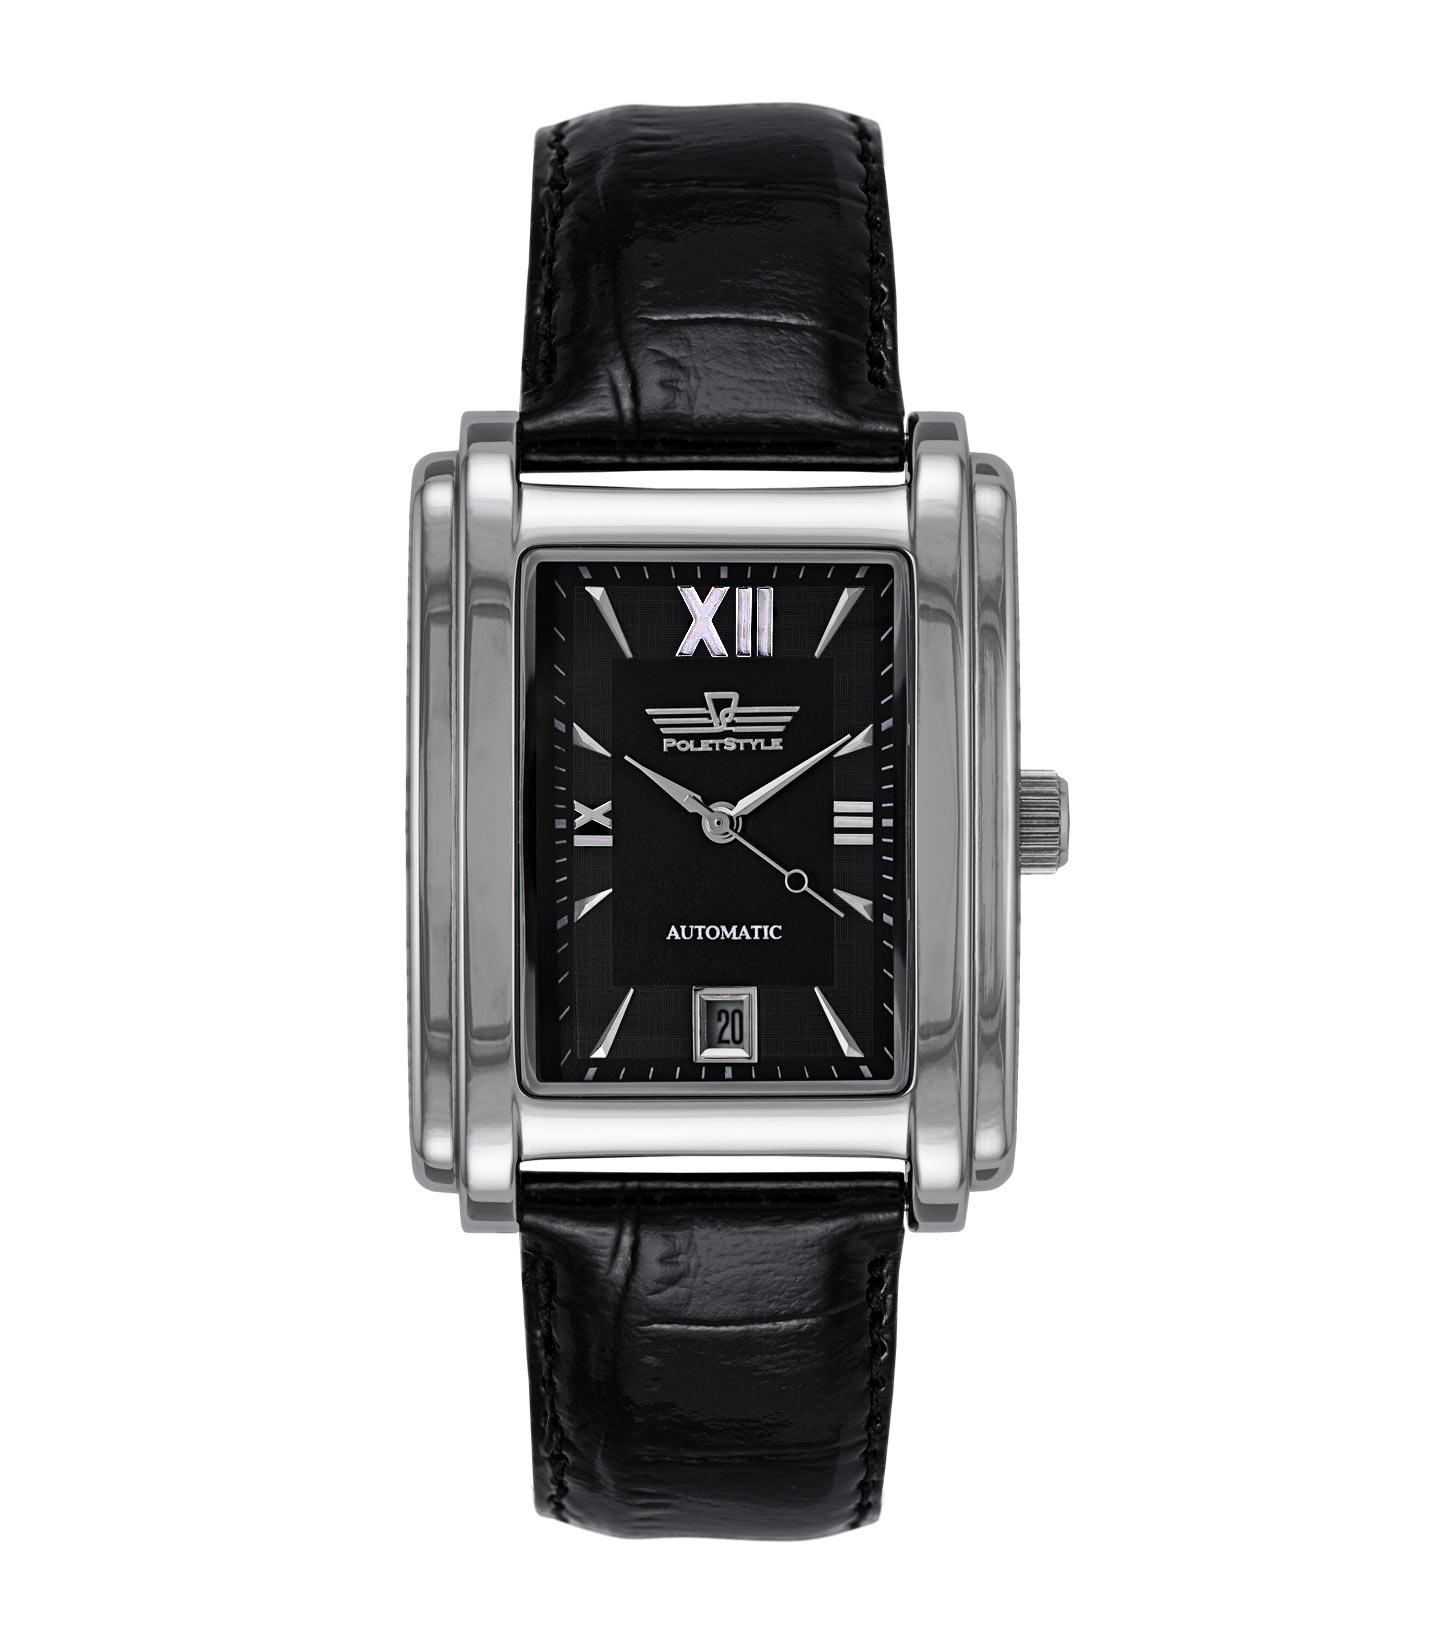 Каталог часов Мужские наручные часы